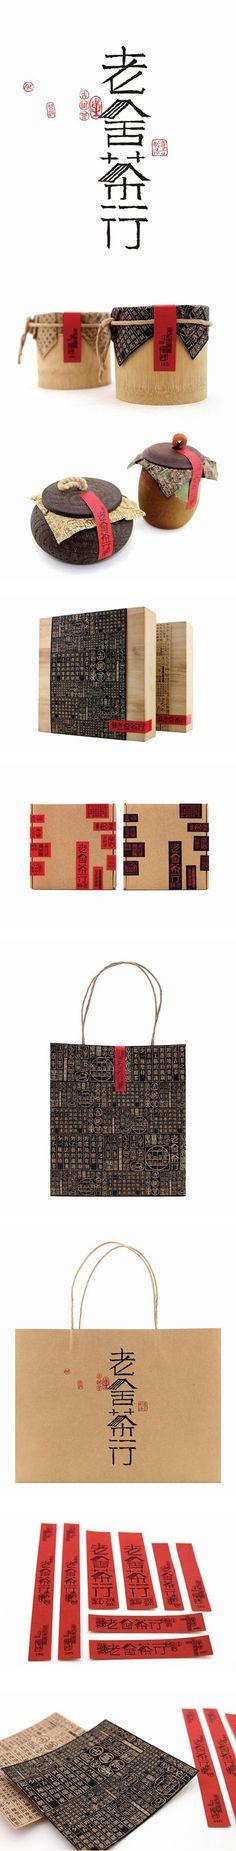 Cool Brand Identity Design. Asian Shopping. #branding #brandidentity [http://www.pinterest.com/alfredchong/]